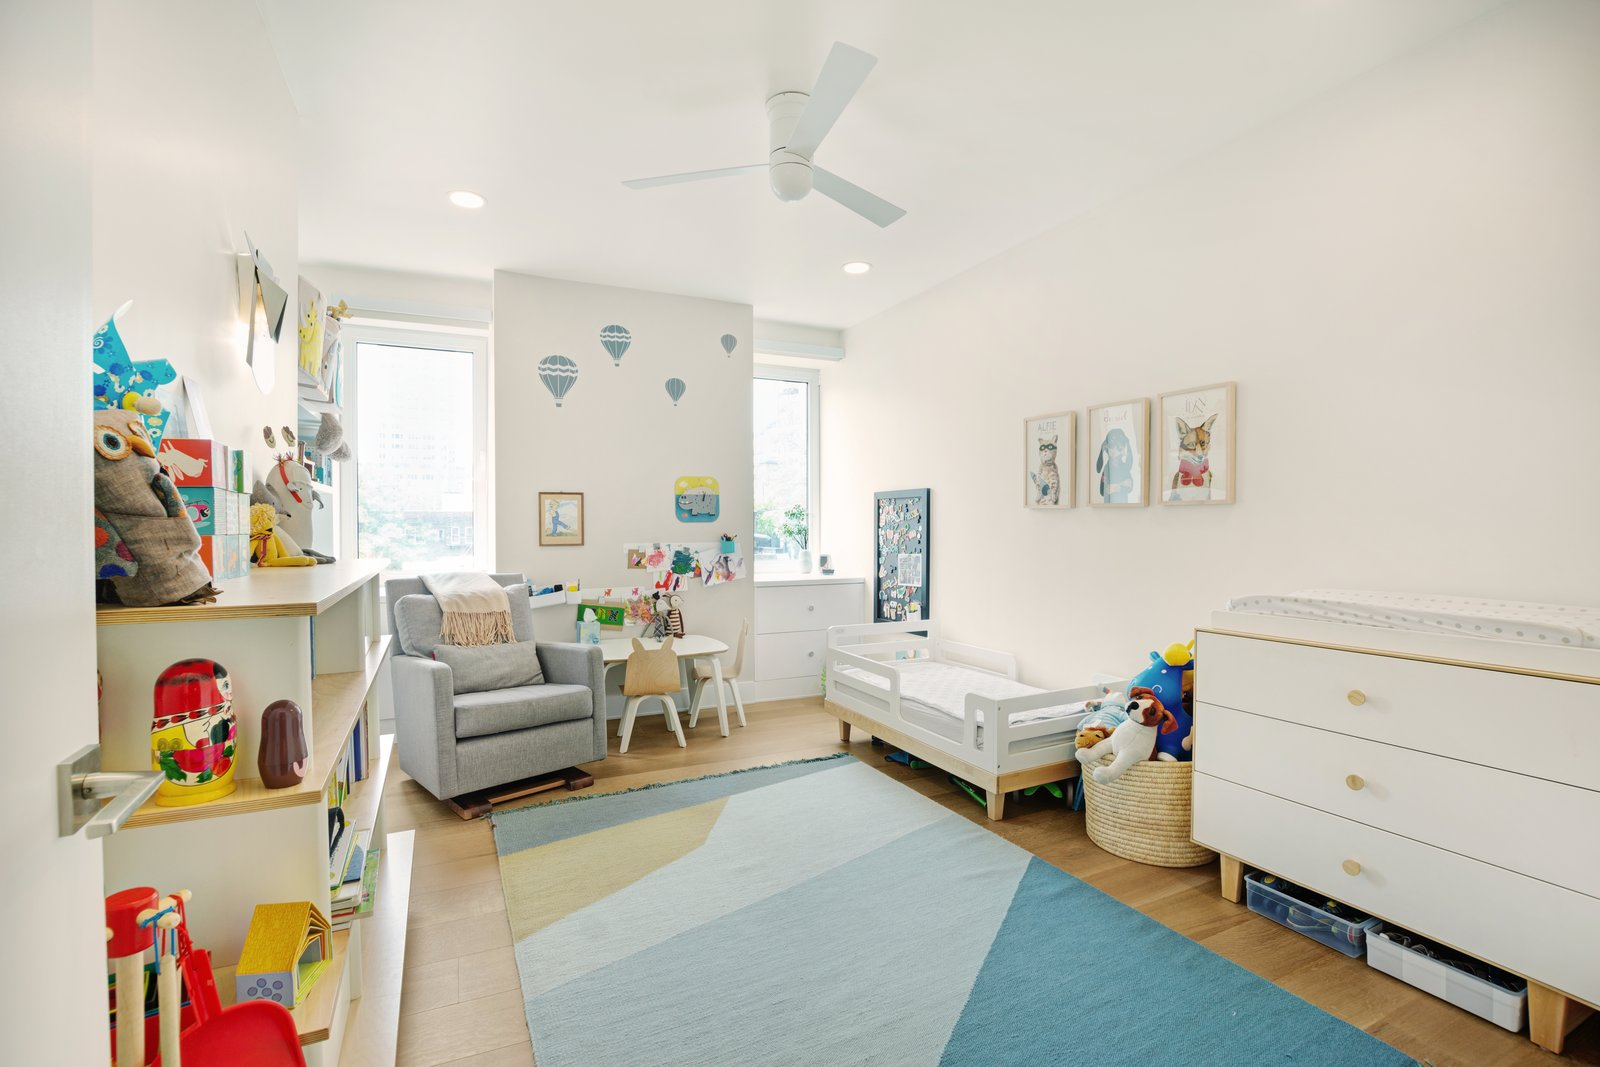 Kids, Medium Hardwood, Toddler, Neutral, Dresser, Bed, Bedroom, Rug, Desk, Shelves, and Chair  Kids Dresser Photos from Greenwich Village Renovation